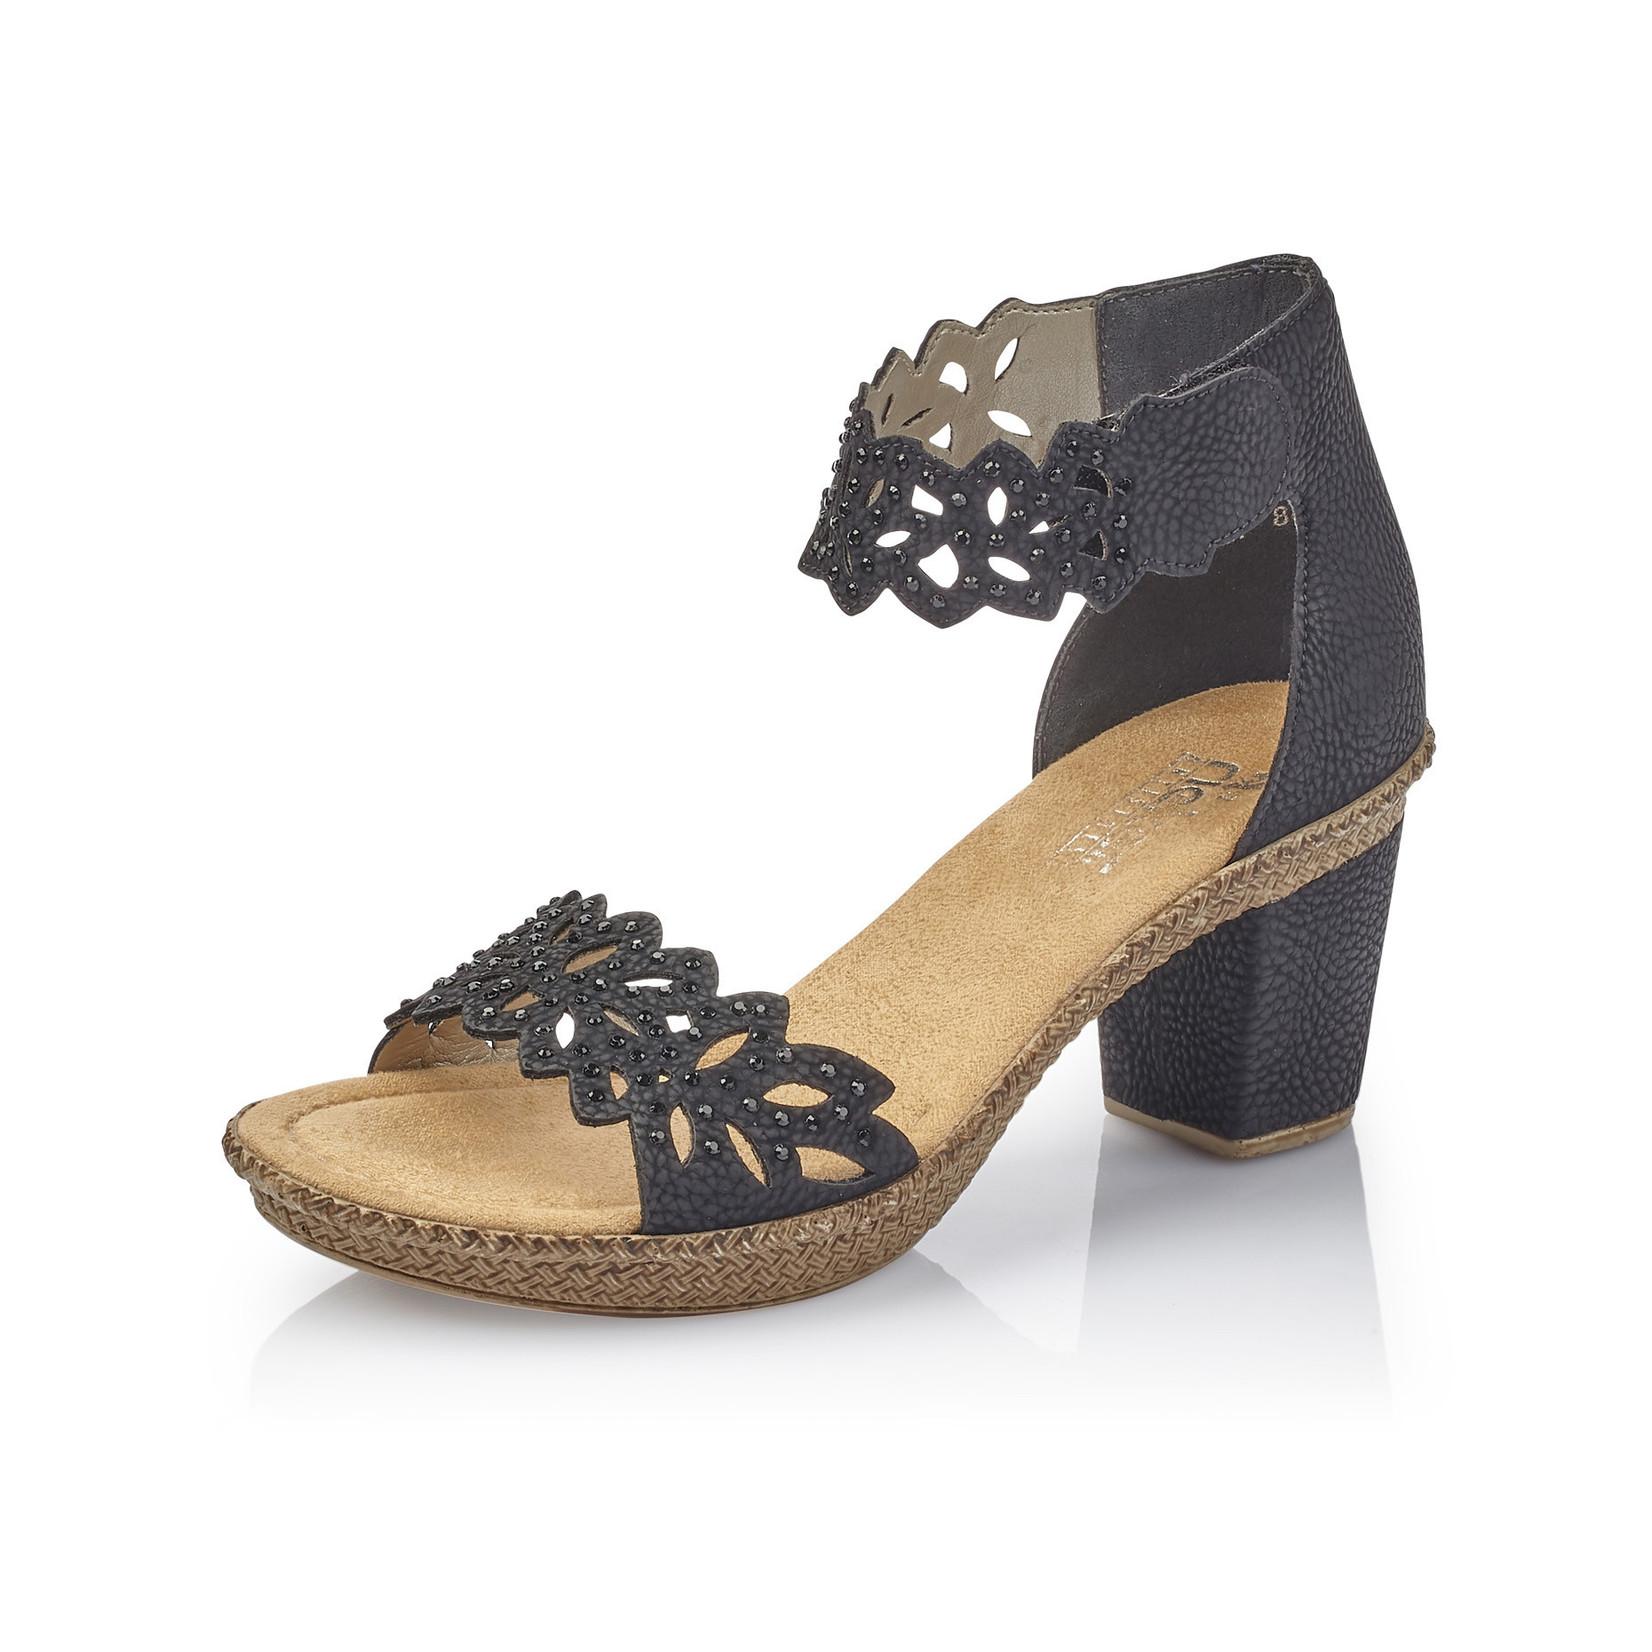 Rieker 66555-01sale only size 37